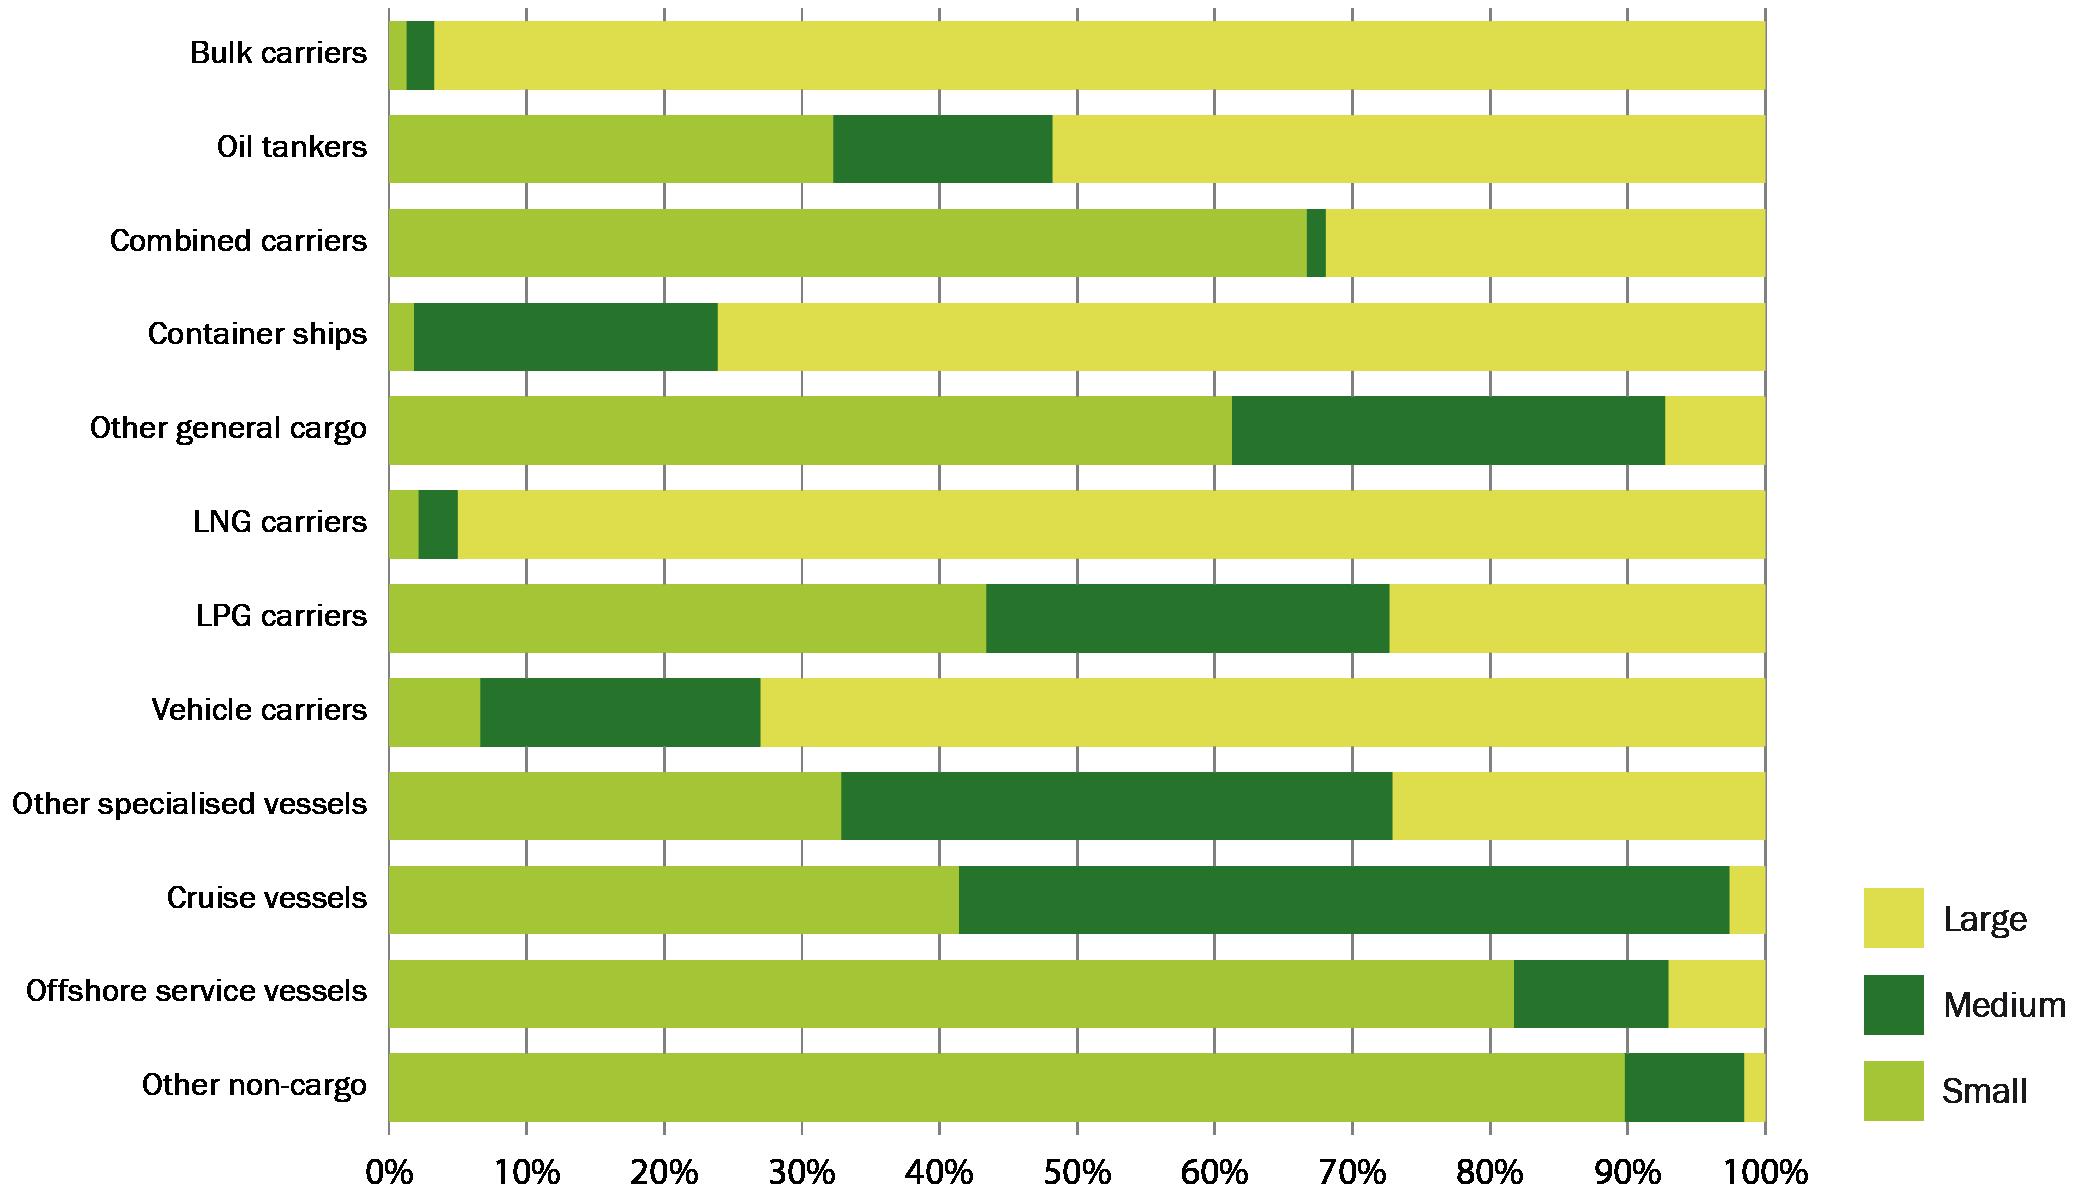 Market analysis breakdown of global merchant fleet by ship type and ballast tank size